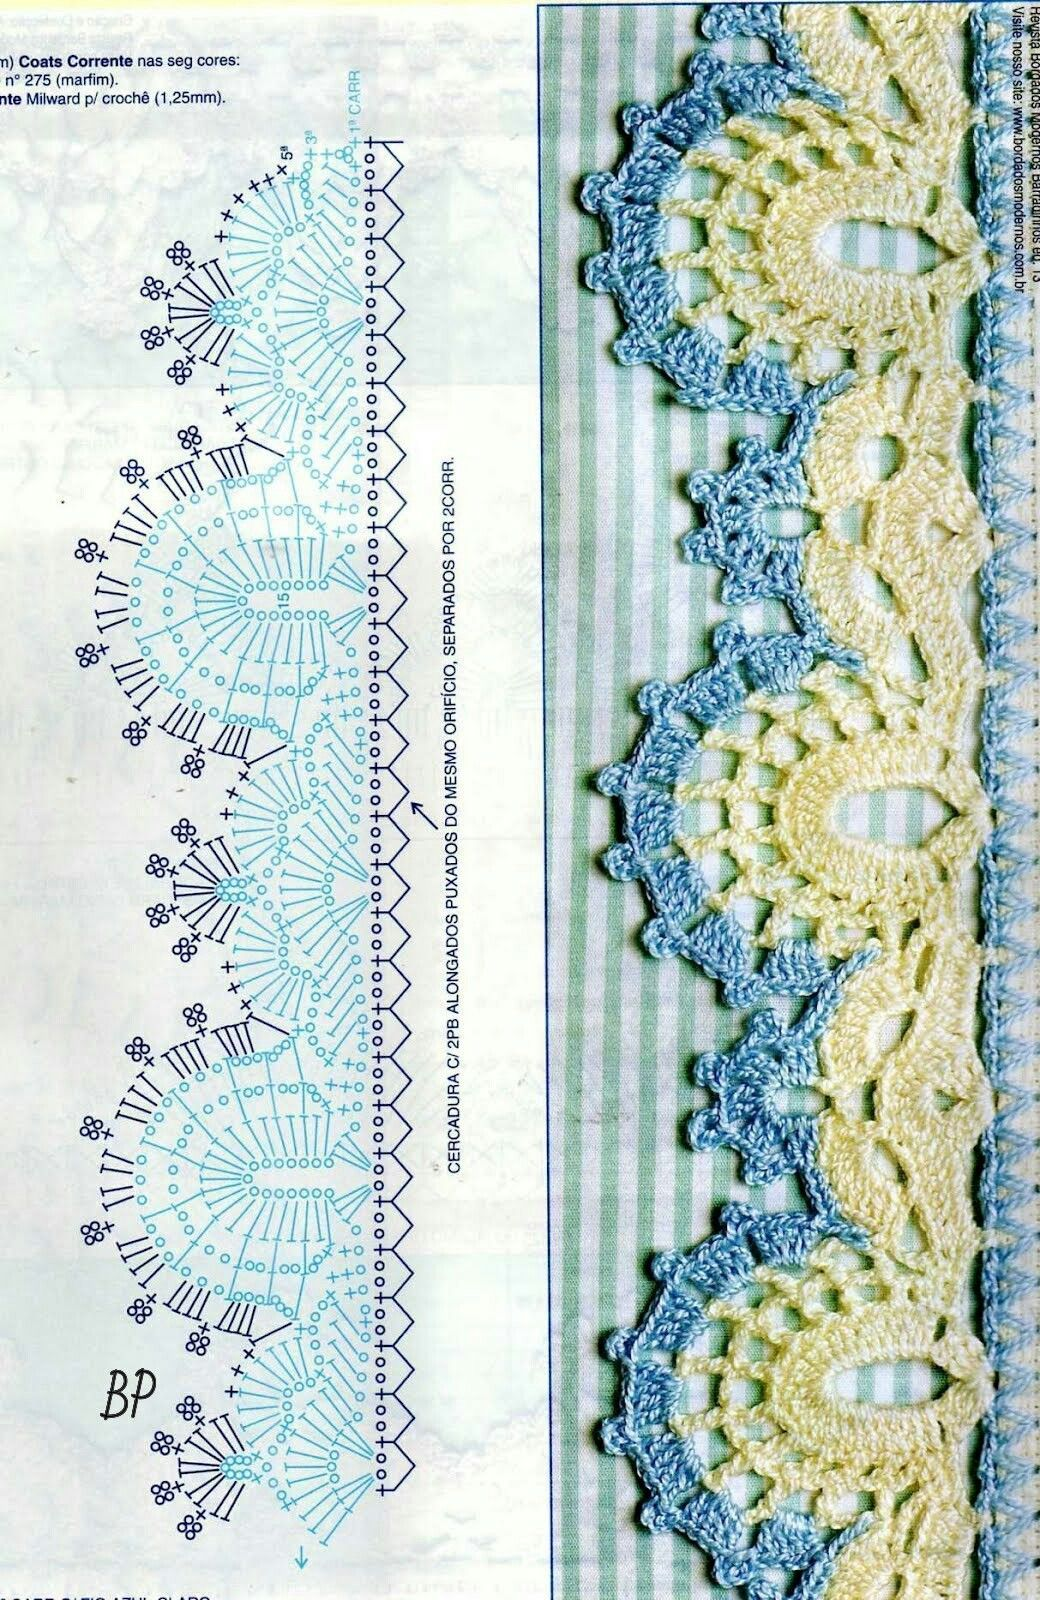 Patrn gratis crochet puntilla guarda borde crochet patrn gratis crochet puntilla guarda borde crochet pattern free border bankloansurffo Image collections